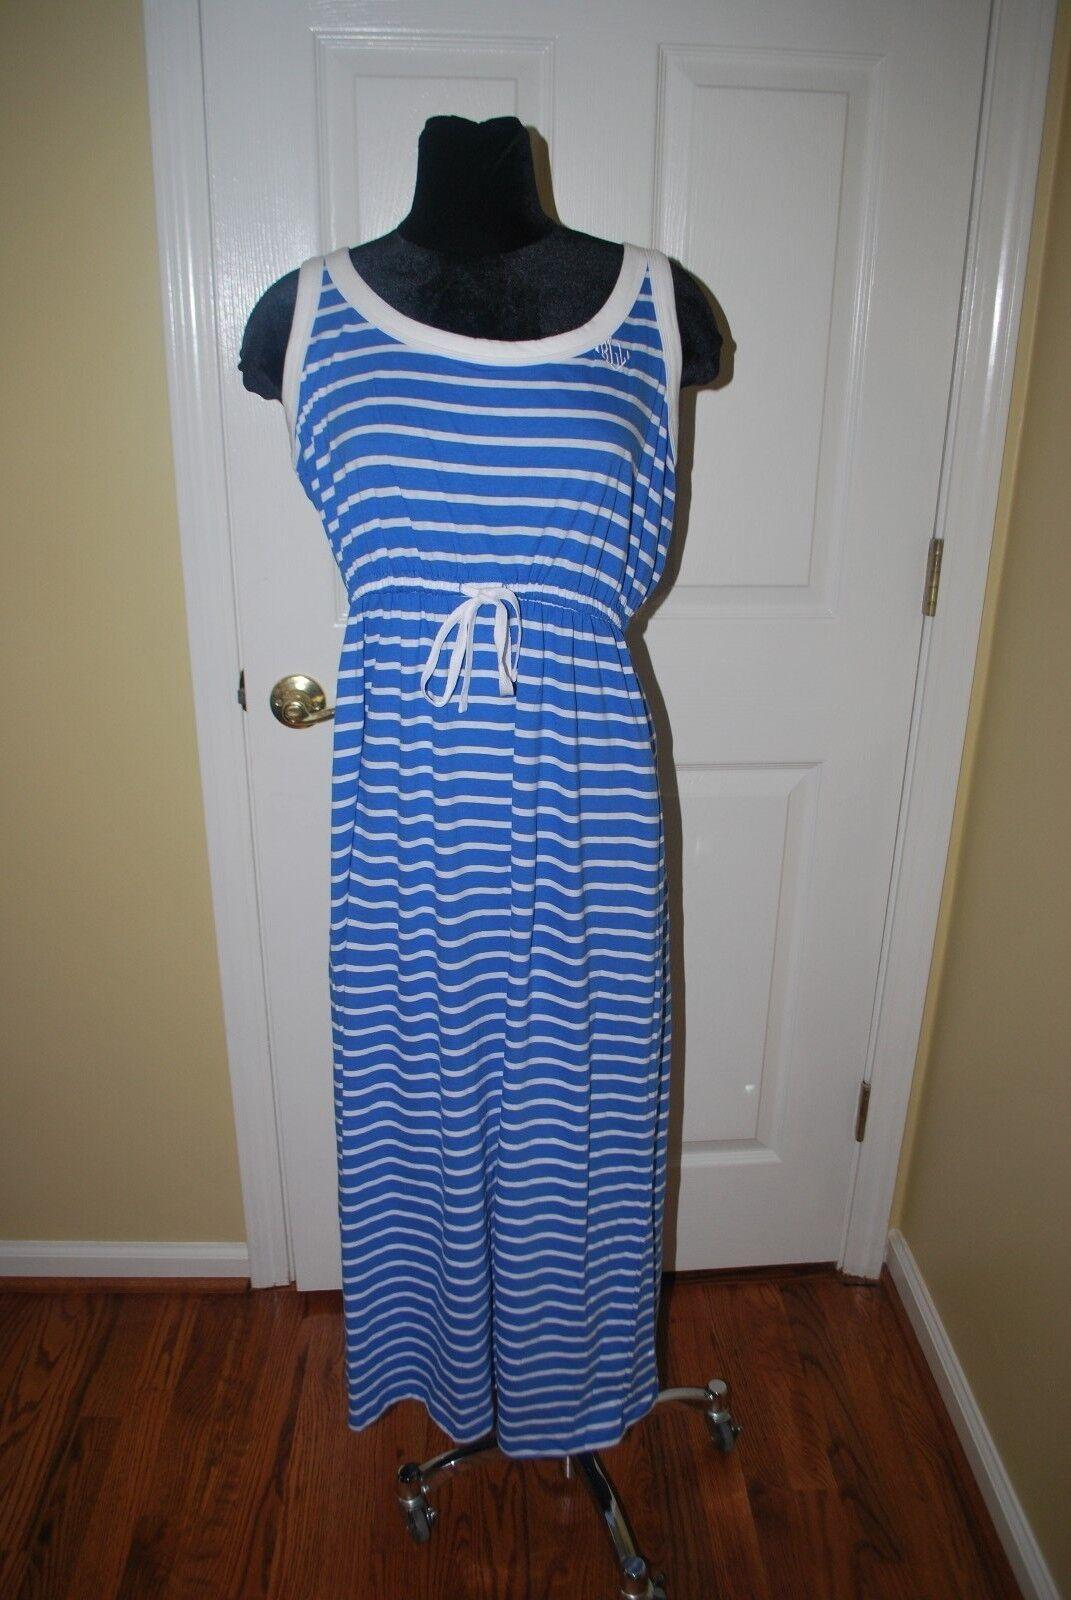 LAUREN RALPH LAUREN COTE D'AZUR blueE WHITE STRIPE SWIM COVER UP DRESS SMALL